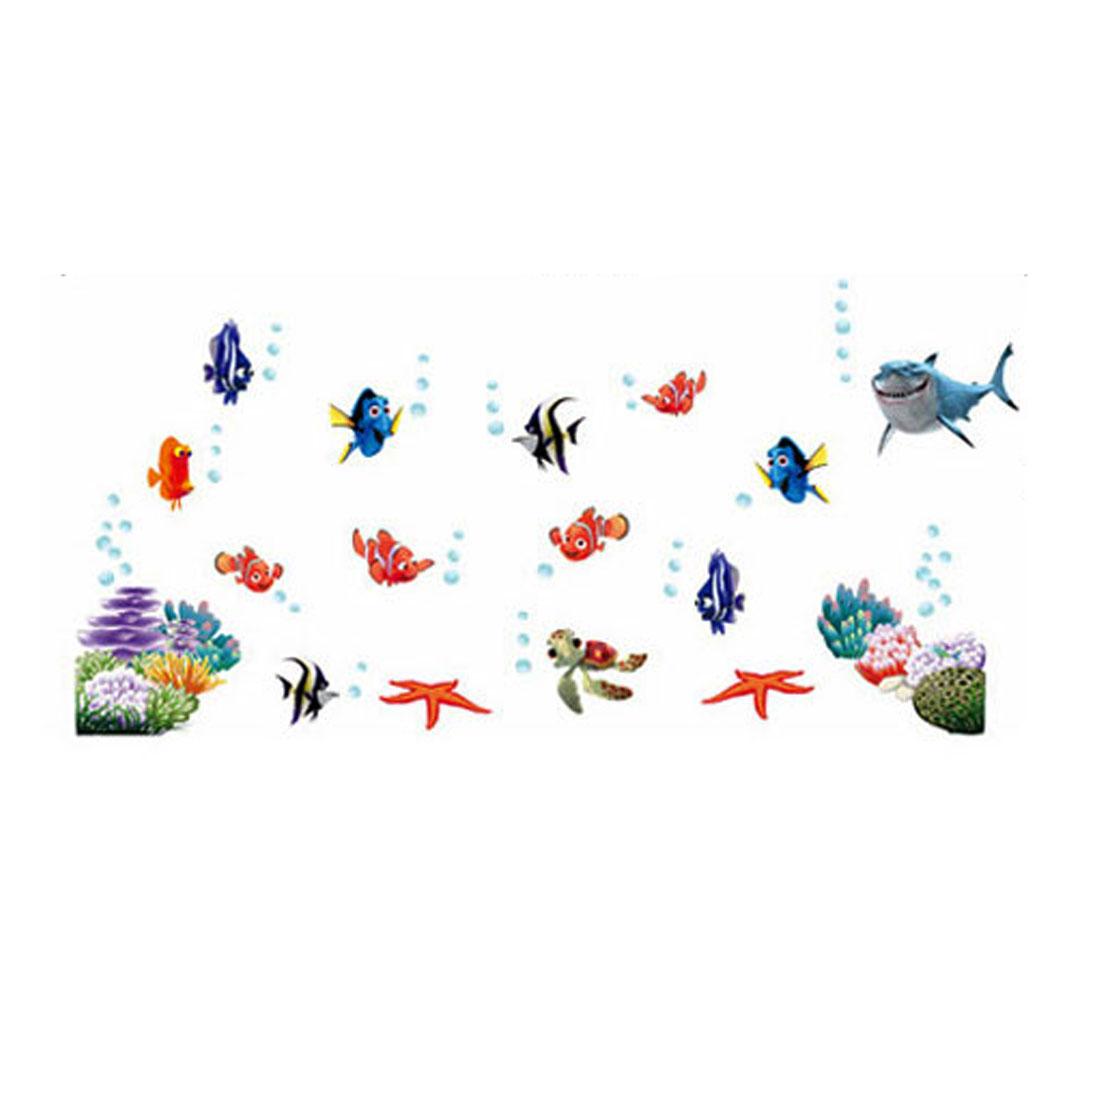 Home Decor Under Water Fish Pattern Wall Sticker Mural Art Decal